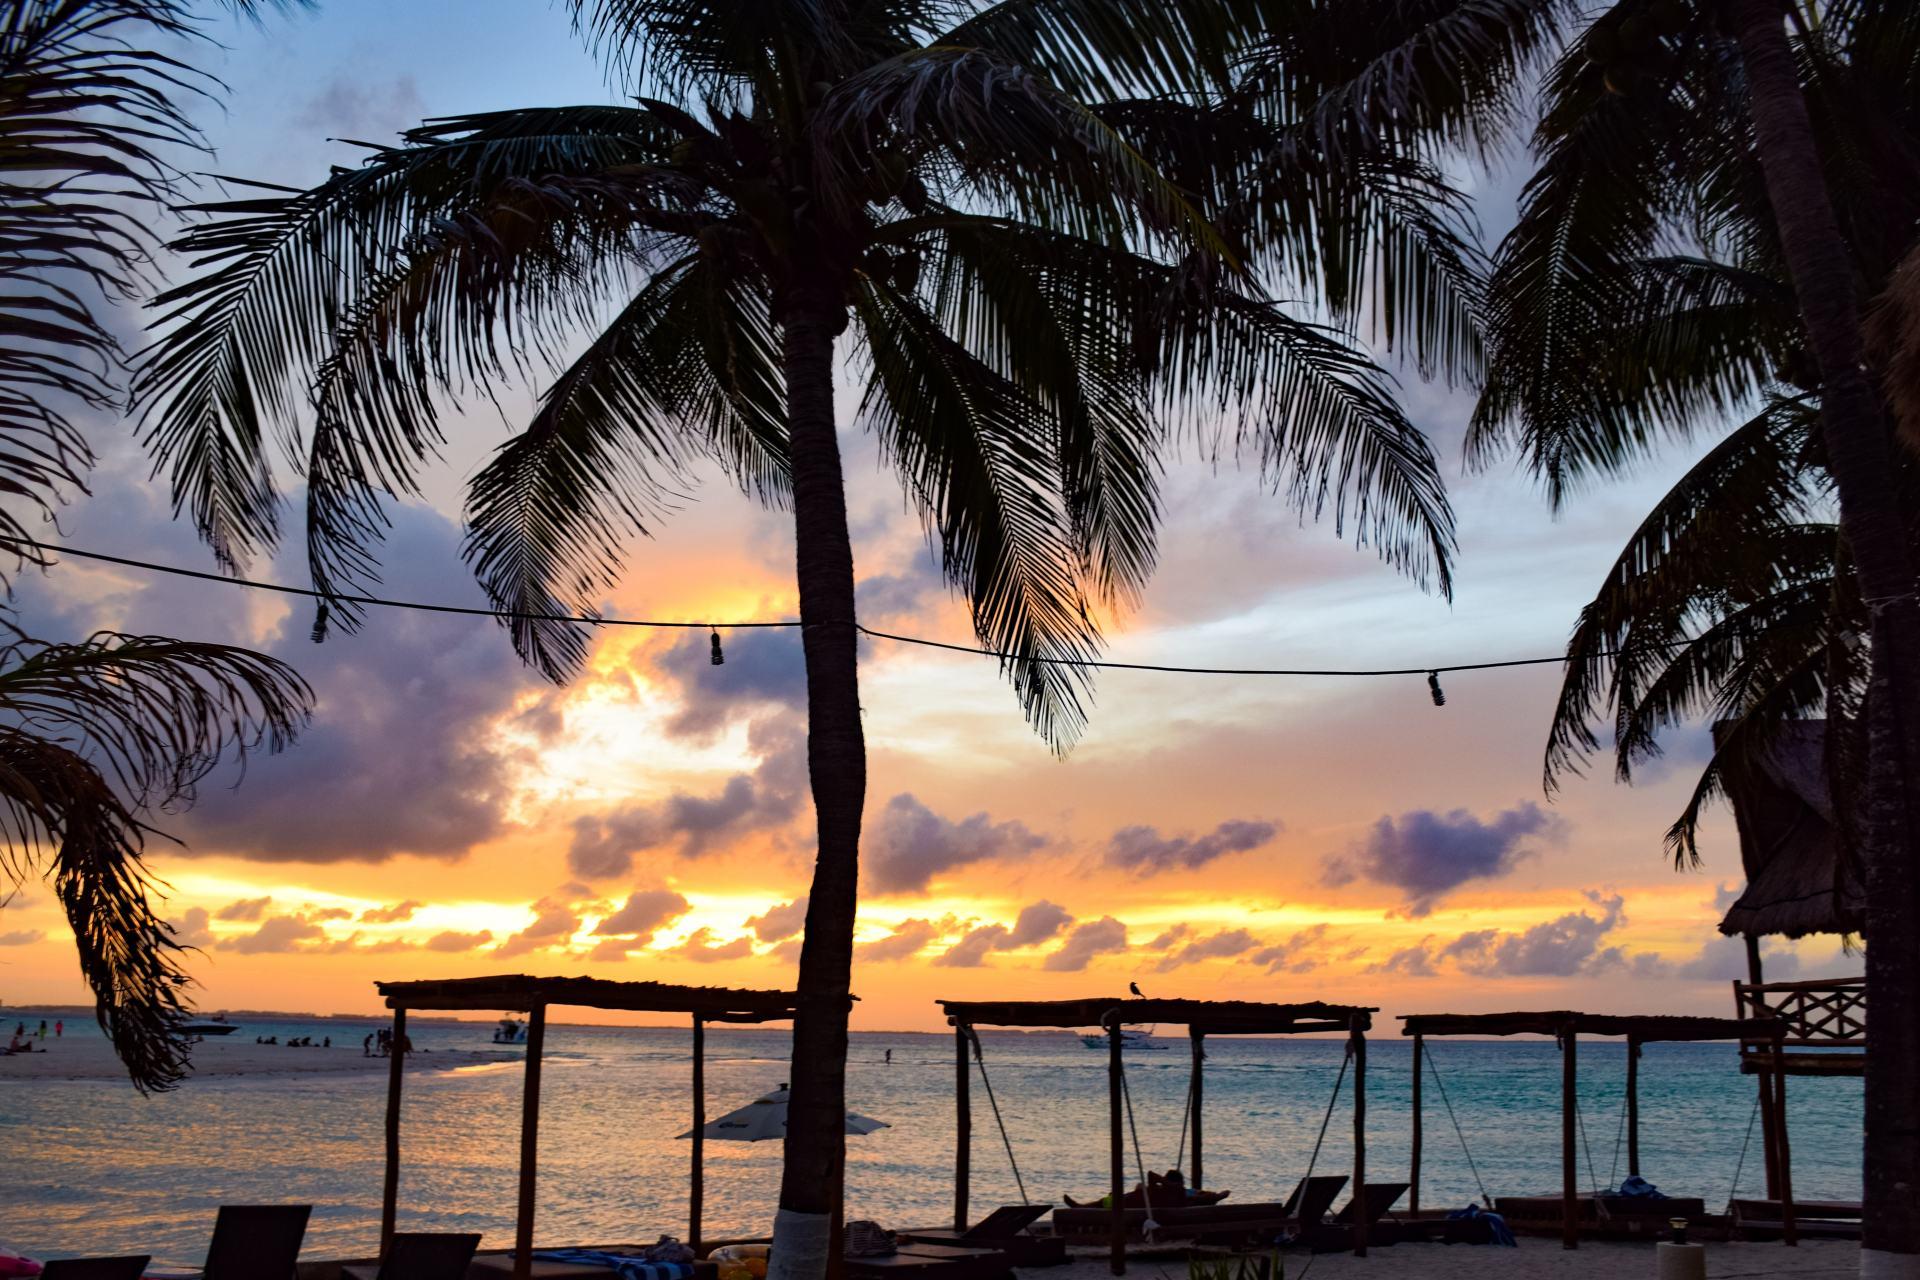 sunset on isla mujeres